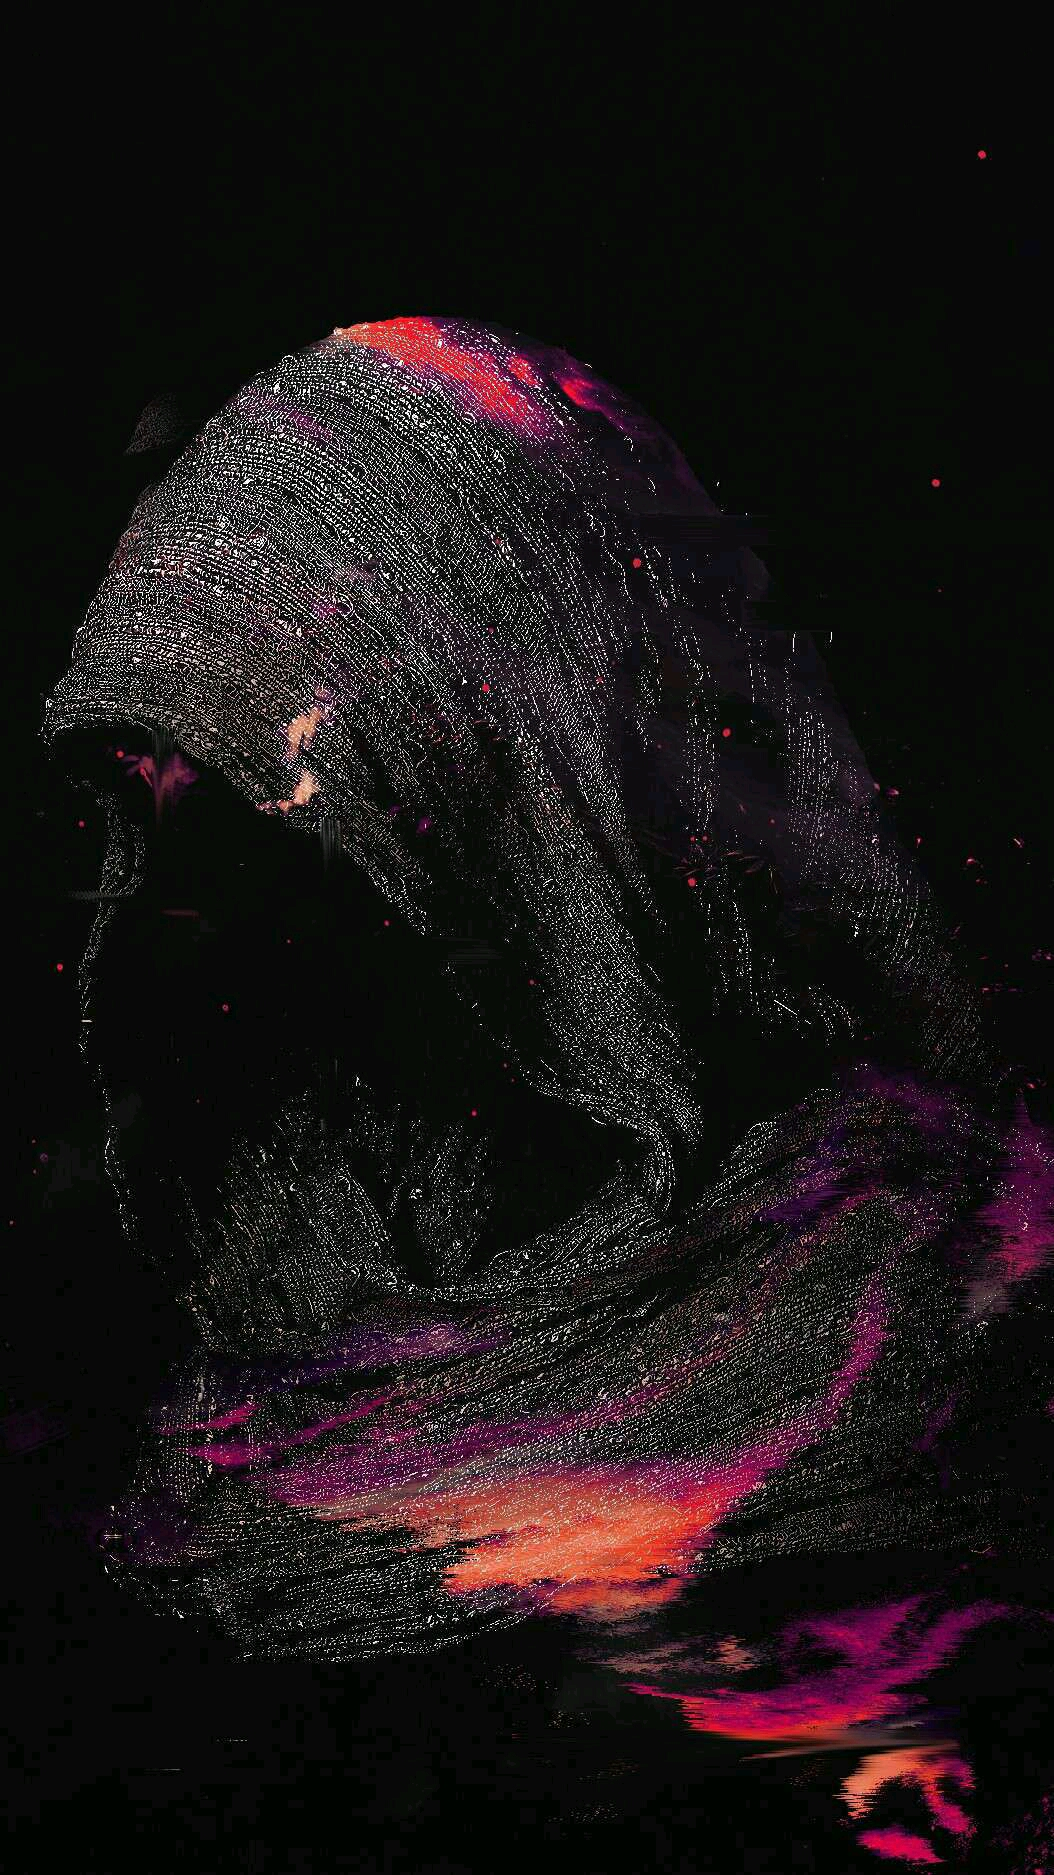 Black Screen Wallpaper Hd Posted By Samantha Johnson